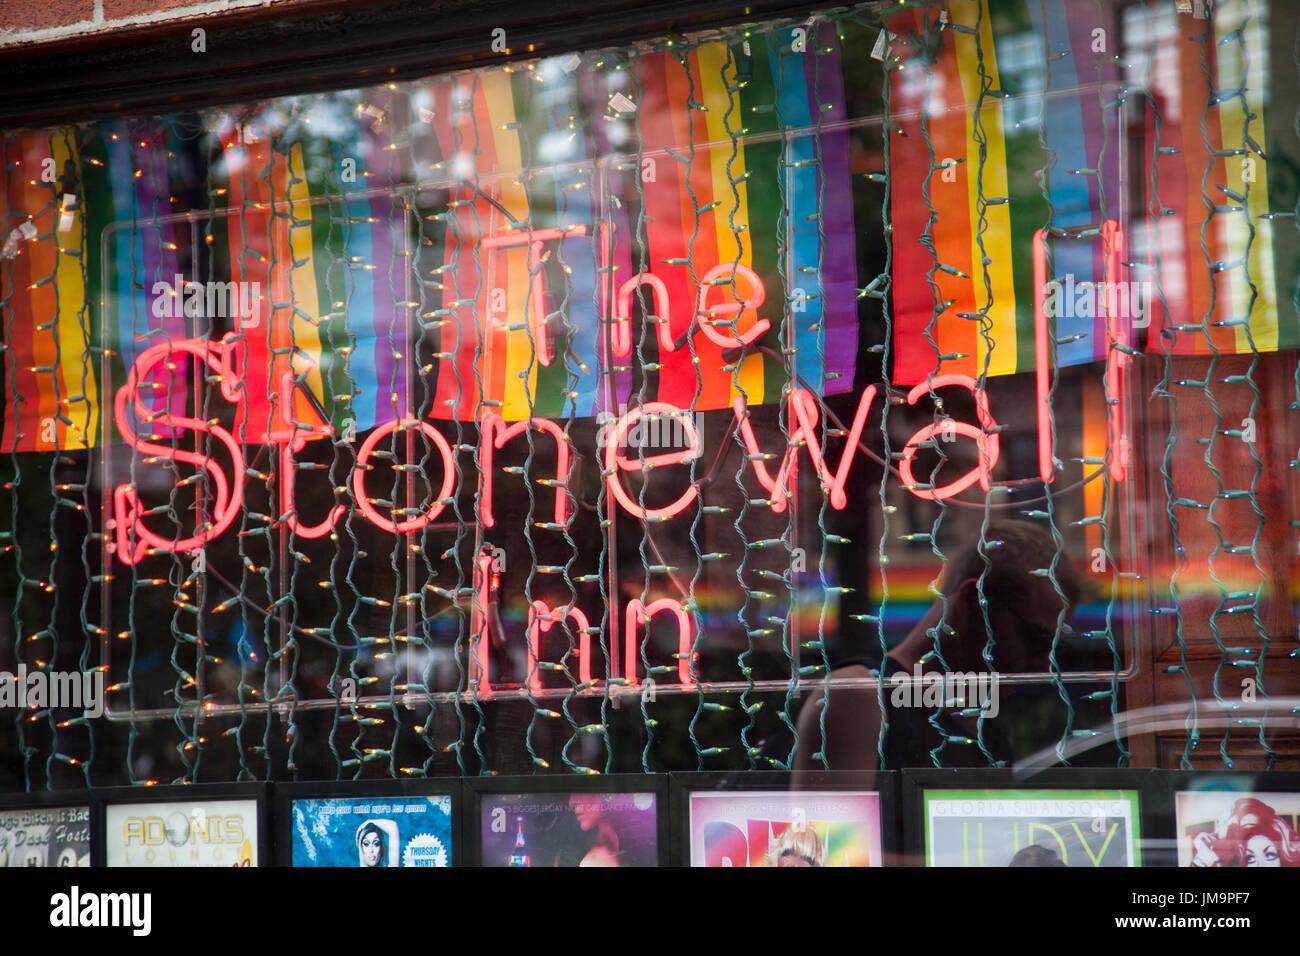 gay bars in greenwich village